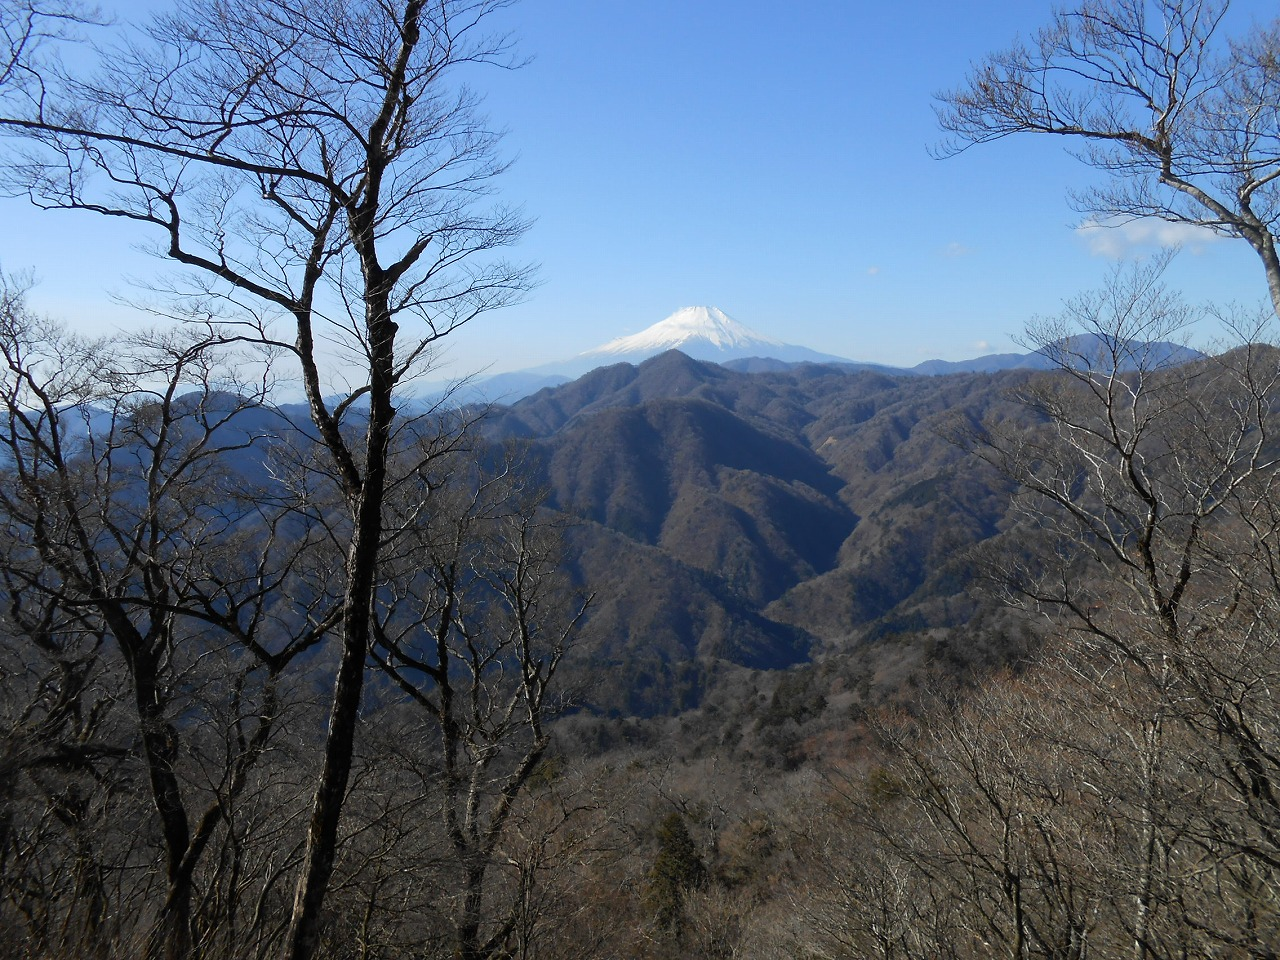 C:\Users\SuzukiShigehiko\Documents\横浜ハイキングクラブ\丹沢\大室山\180113\DSCN2225.jpg